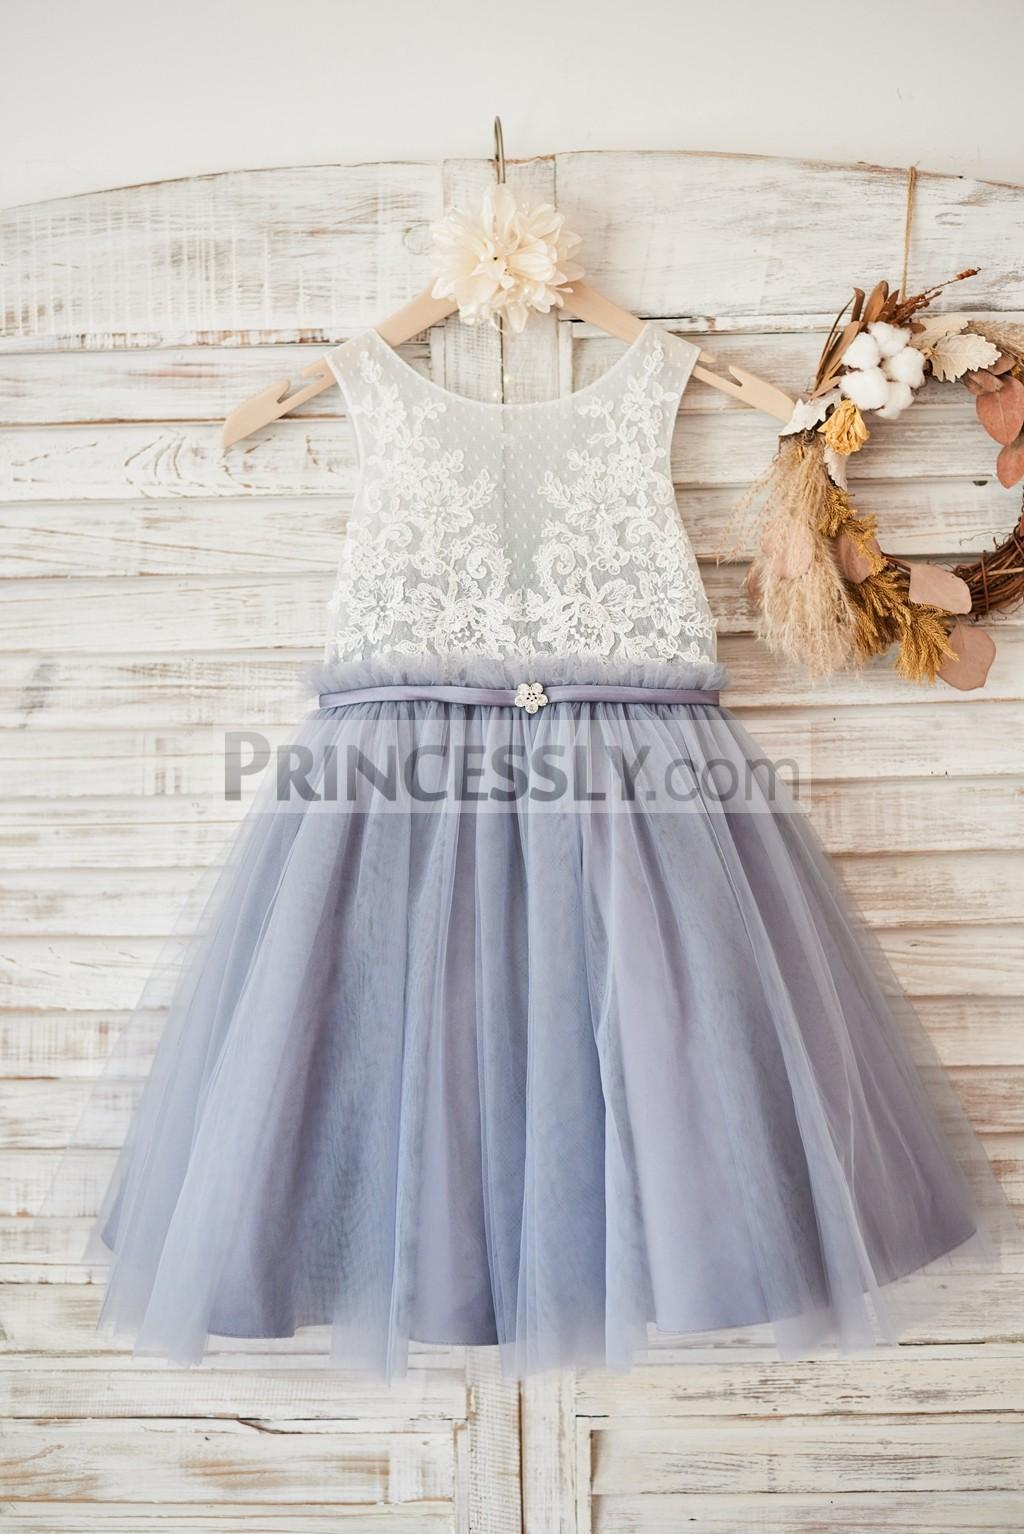 Ivory lace gray tulle wedding flower girl dress